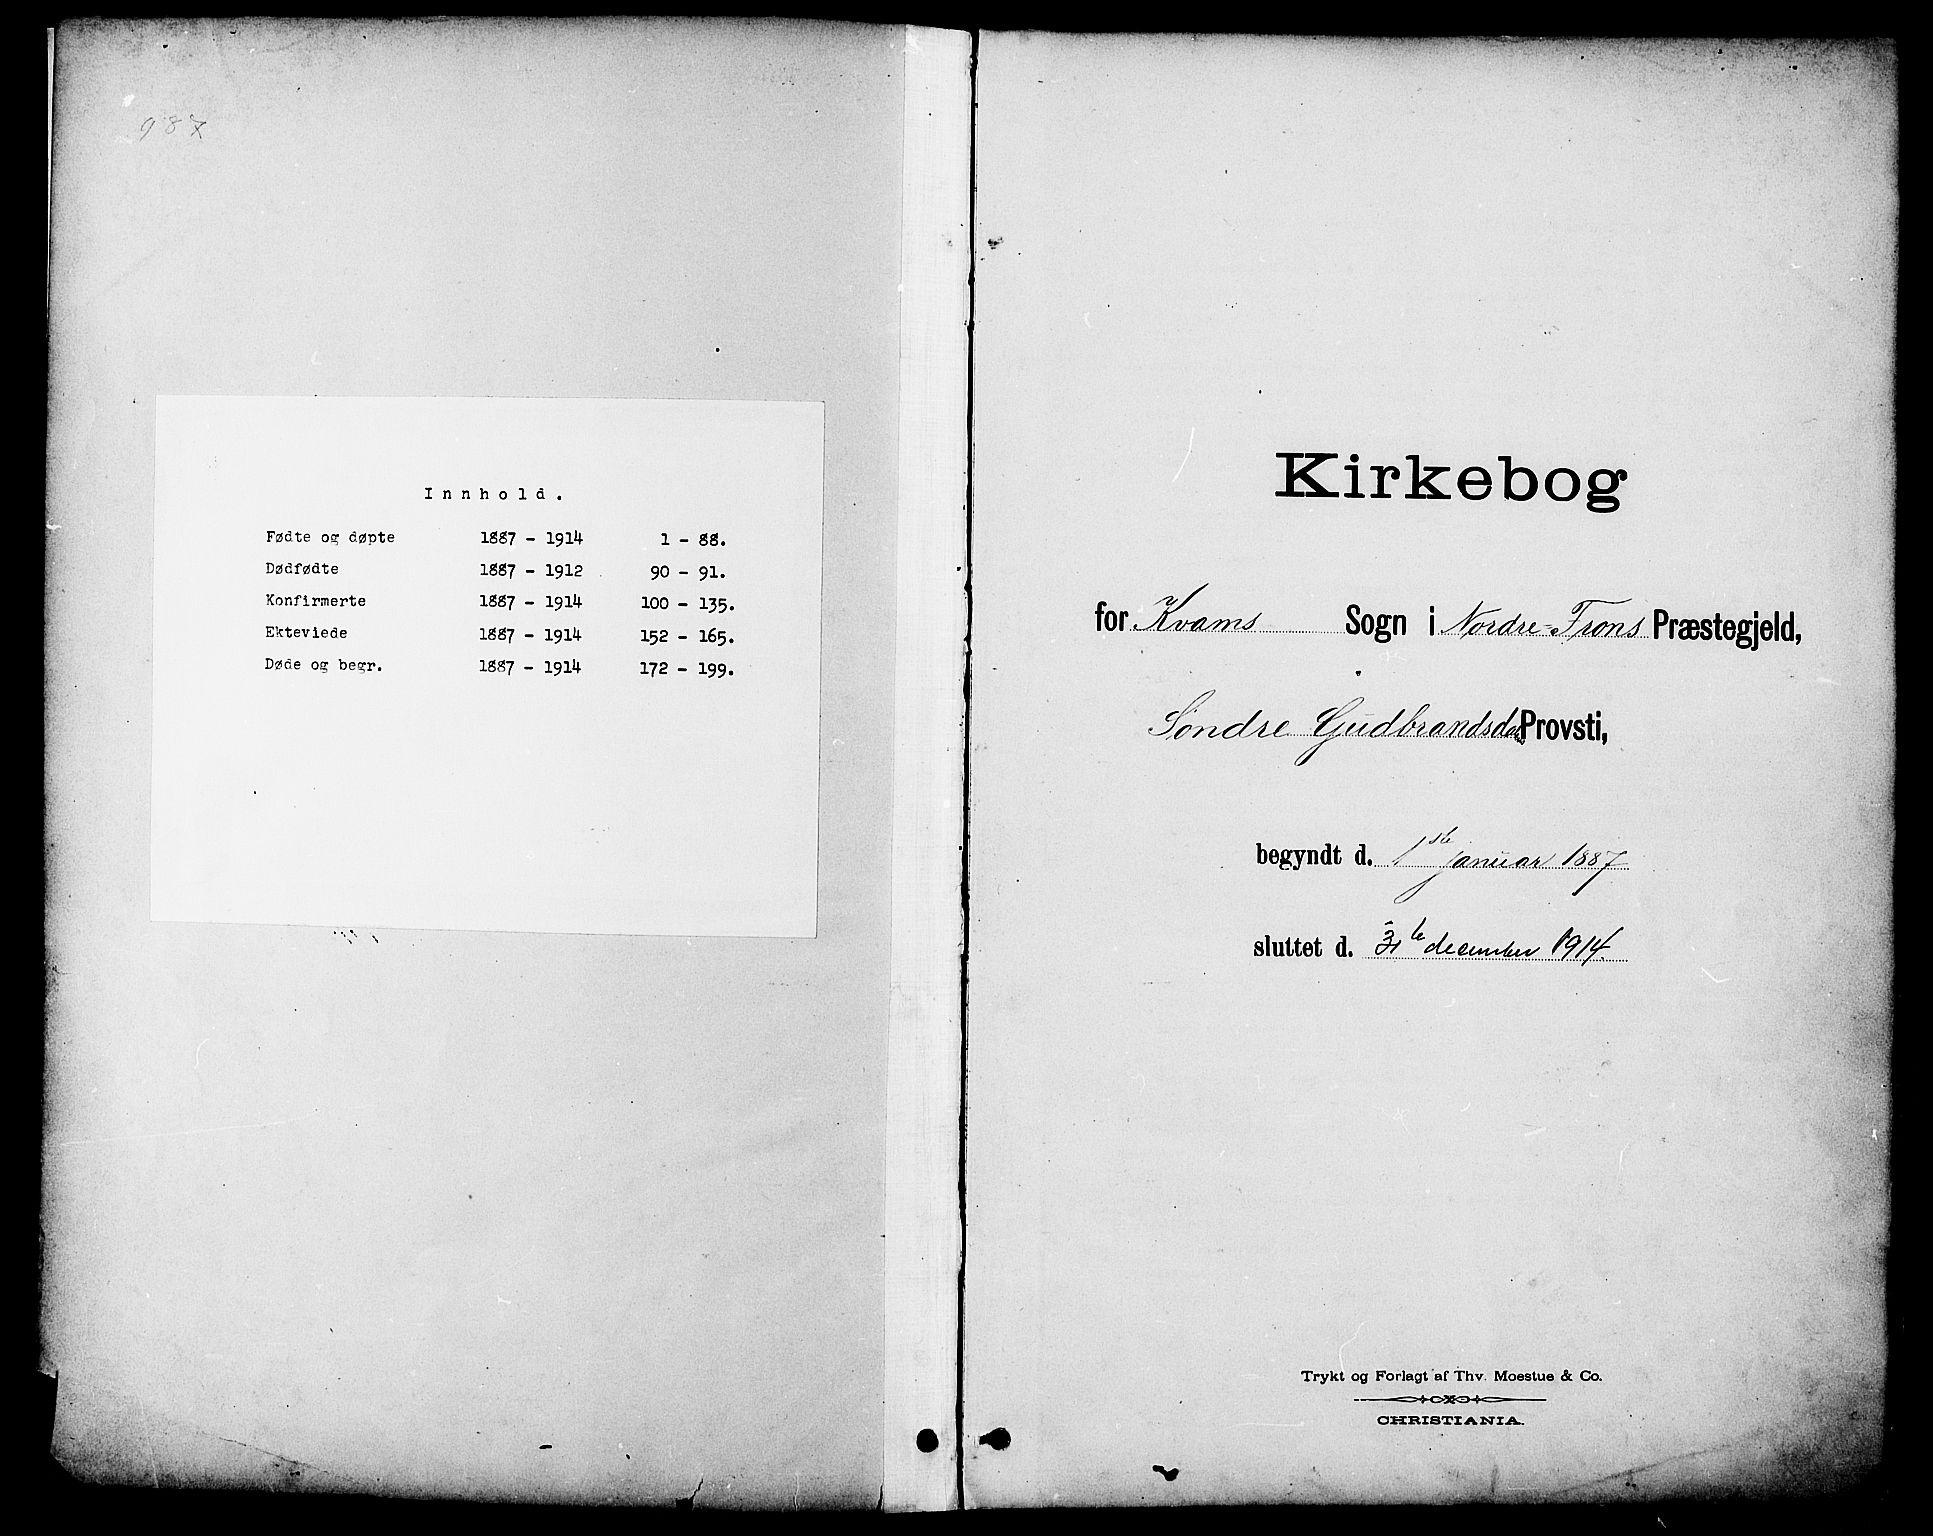 SAH, Nord-Fron prestekontor, Klokkerbok nr. 6, 1887-1914